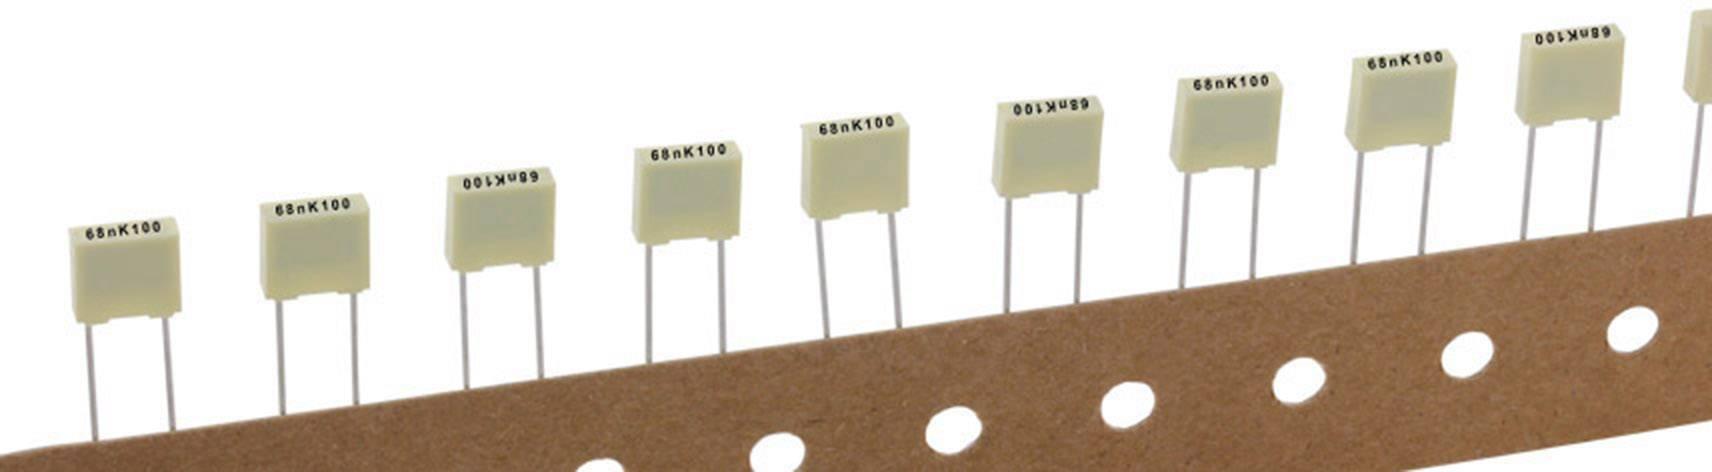 Polyesterový kondenzátor Kemet R82EC1470DQ50K+ radiálne vývody, 4.7 nF, 100 V,10 %, 5 mm, (d x š x v) 7.2 x 2.5 mm x 6.5 mm, 1 ks